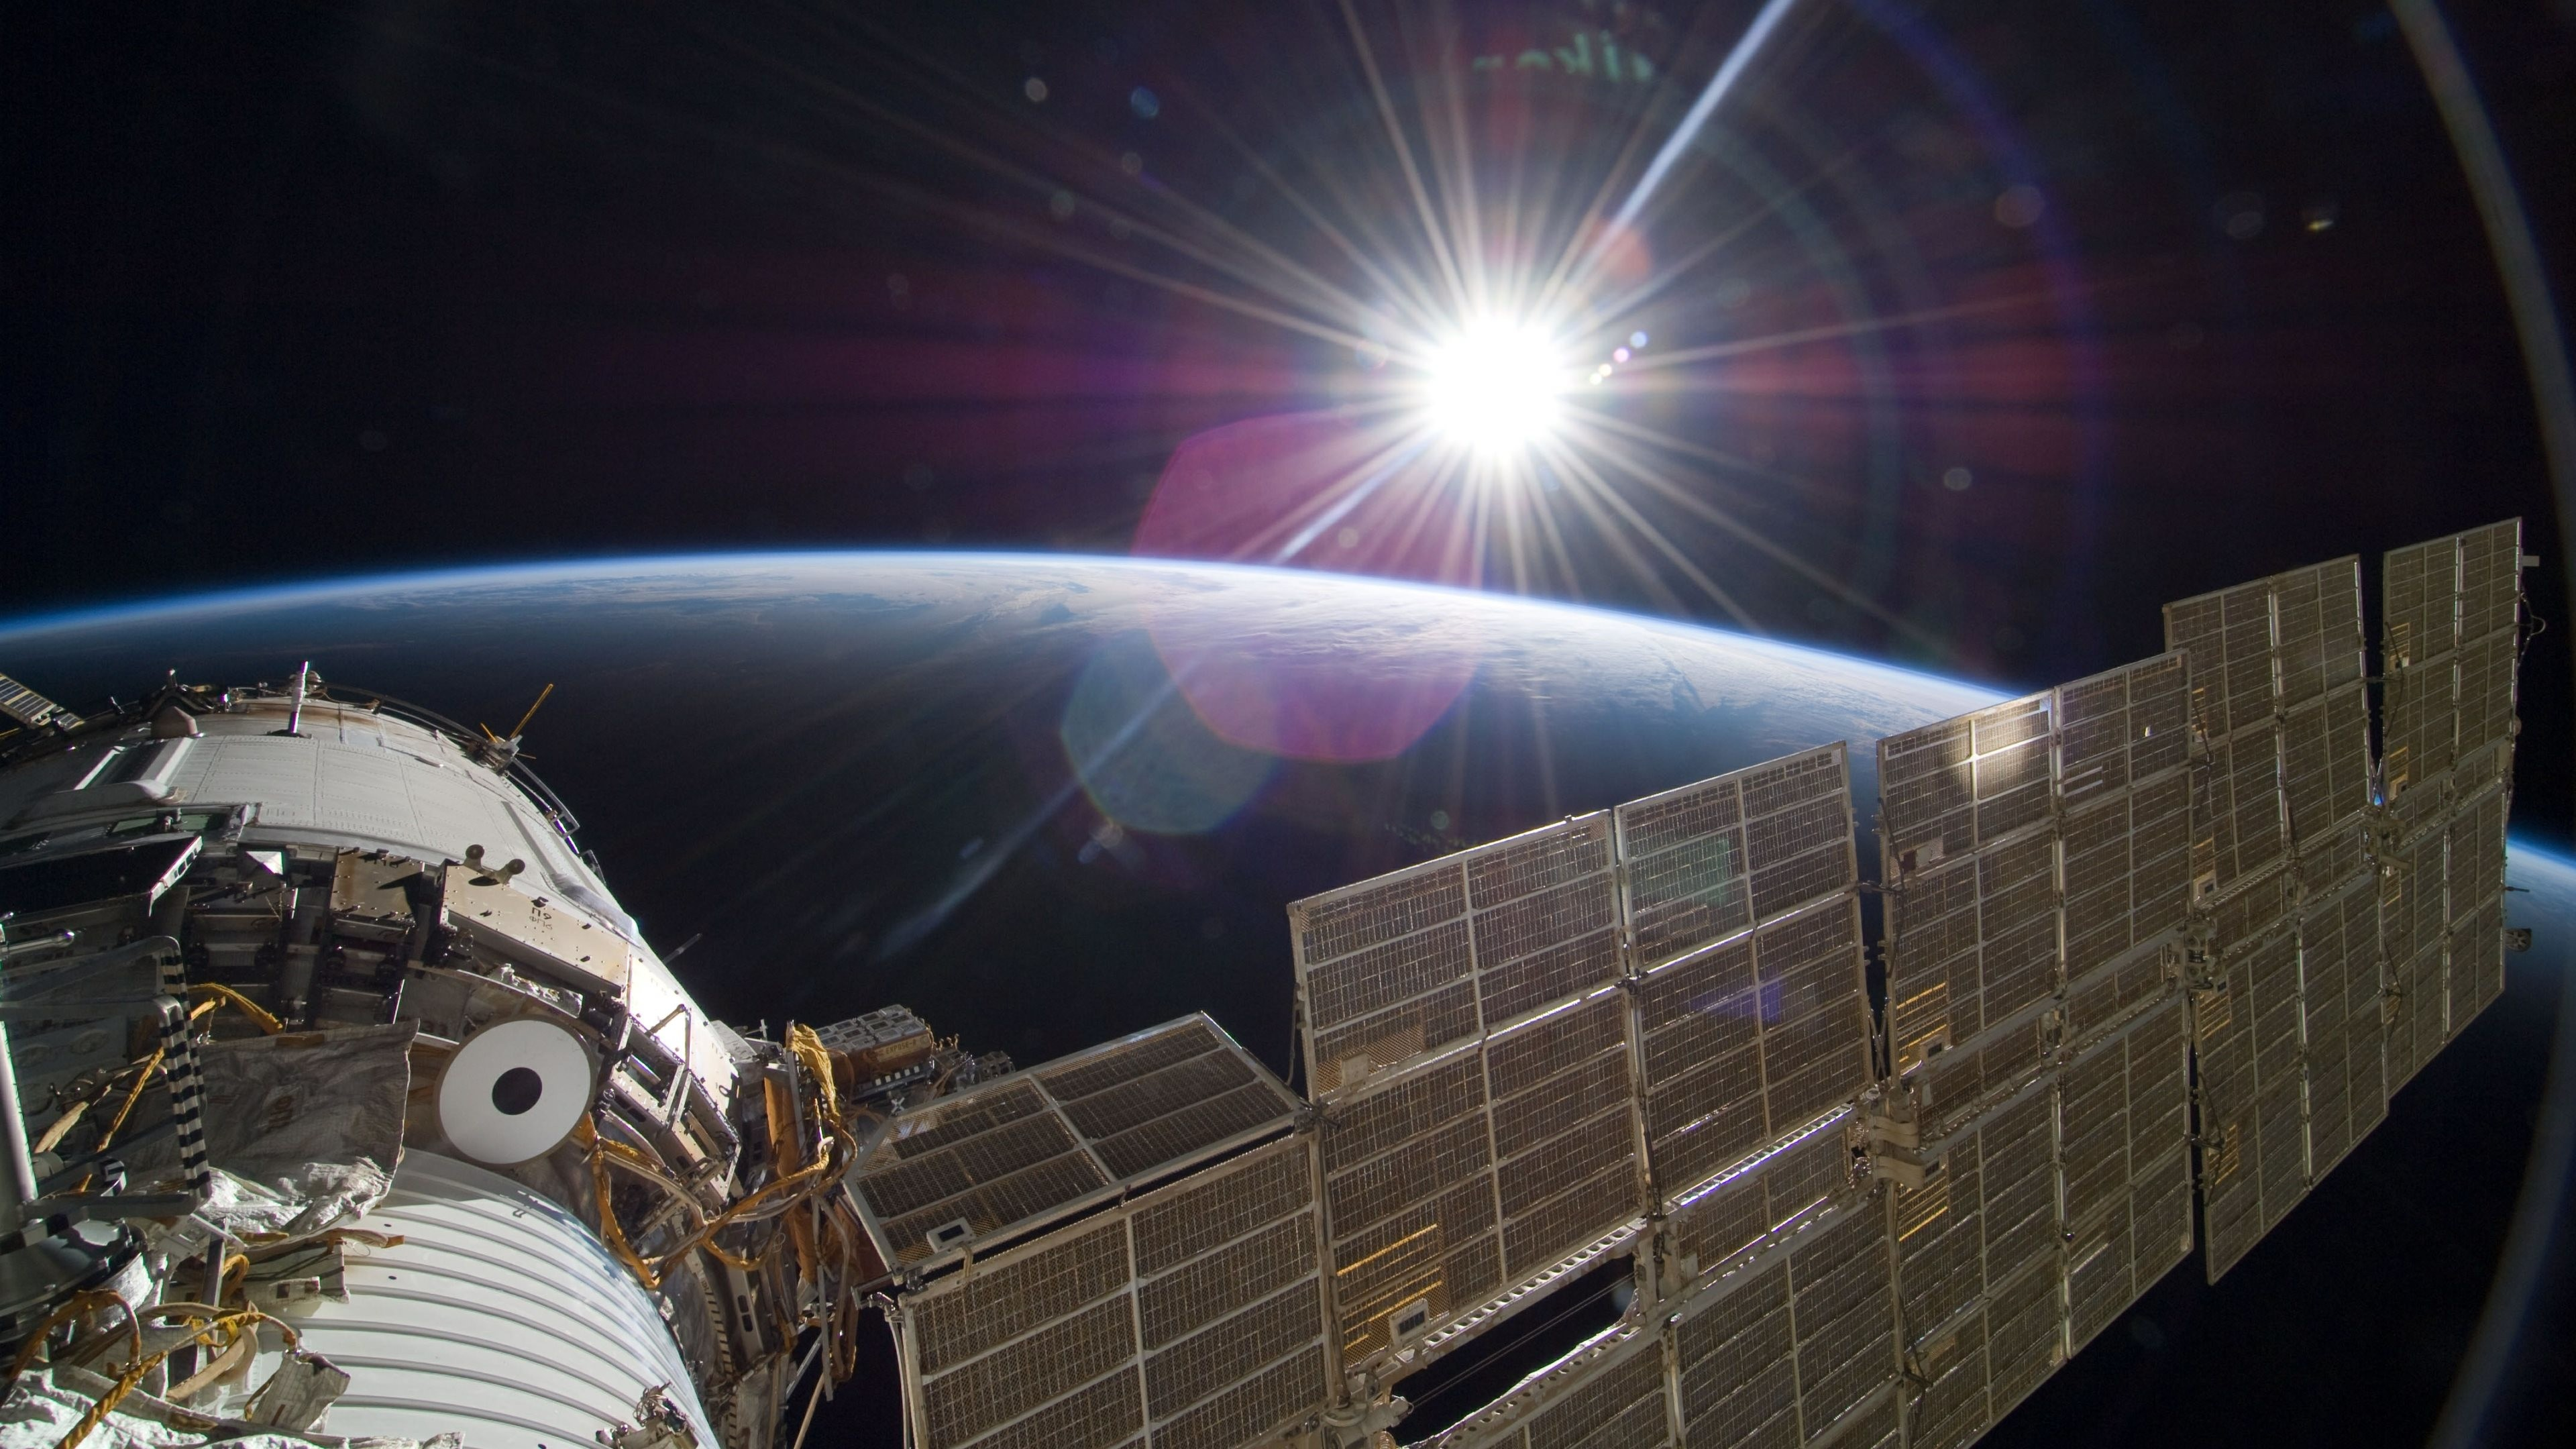 4K HD Wallpaper: Sun Over Earth (NASA, International Space Station Science)